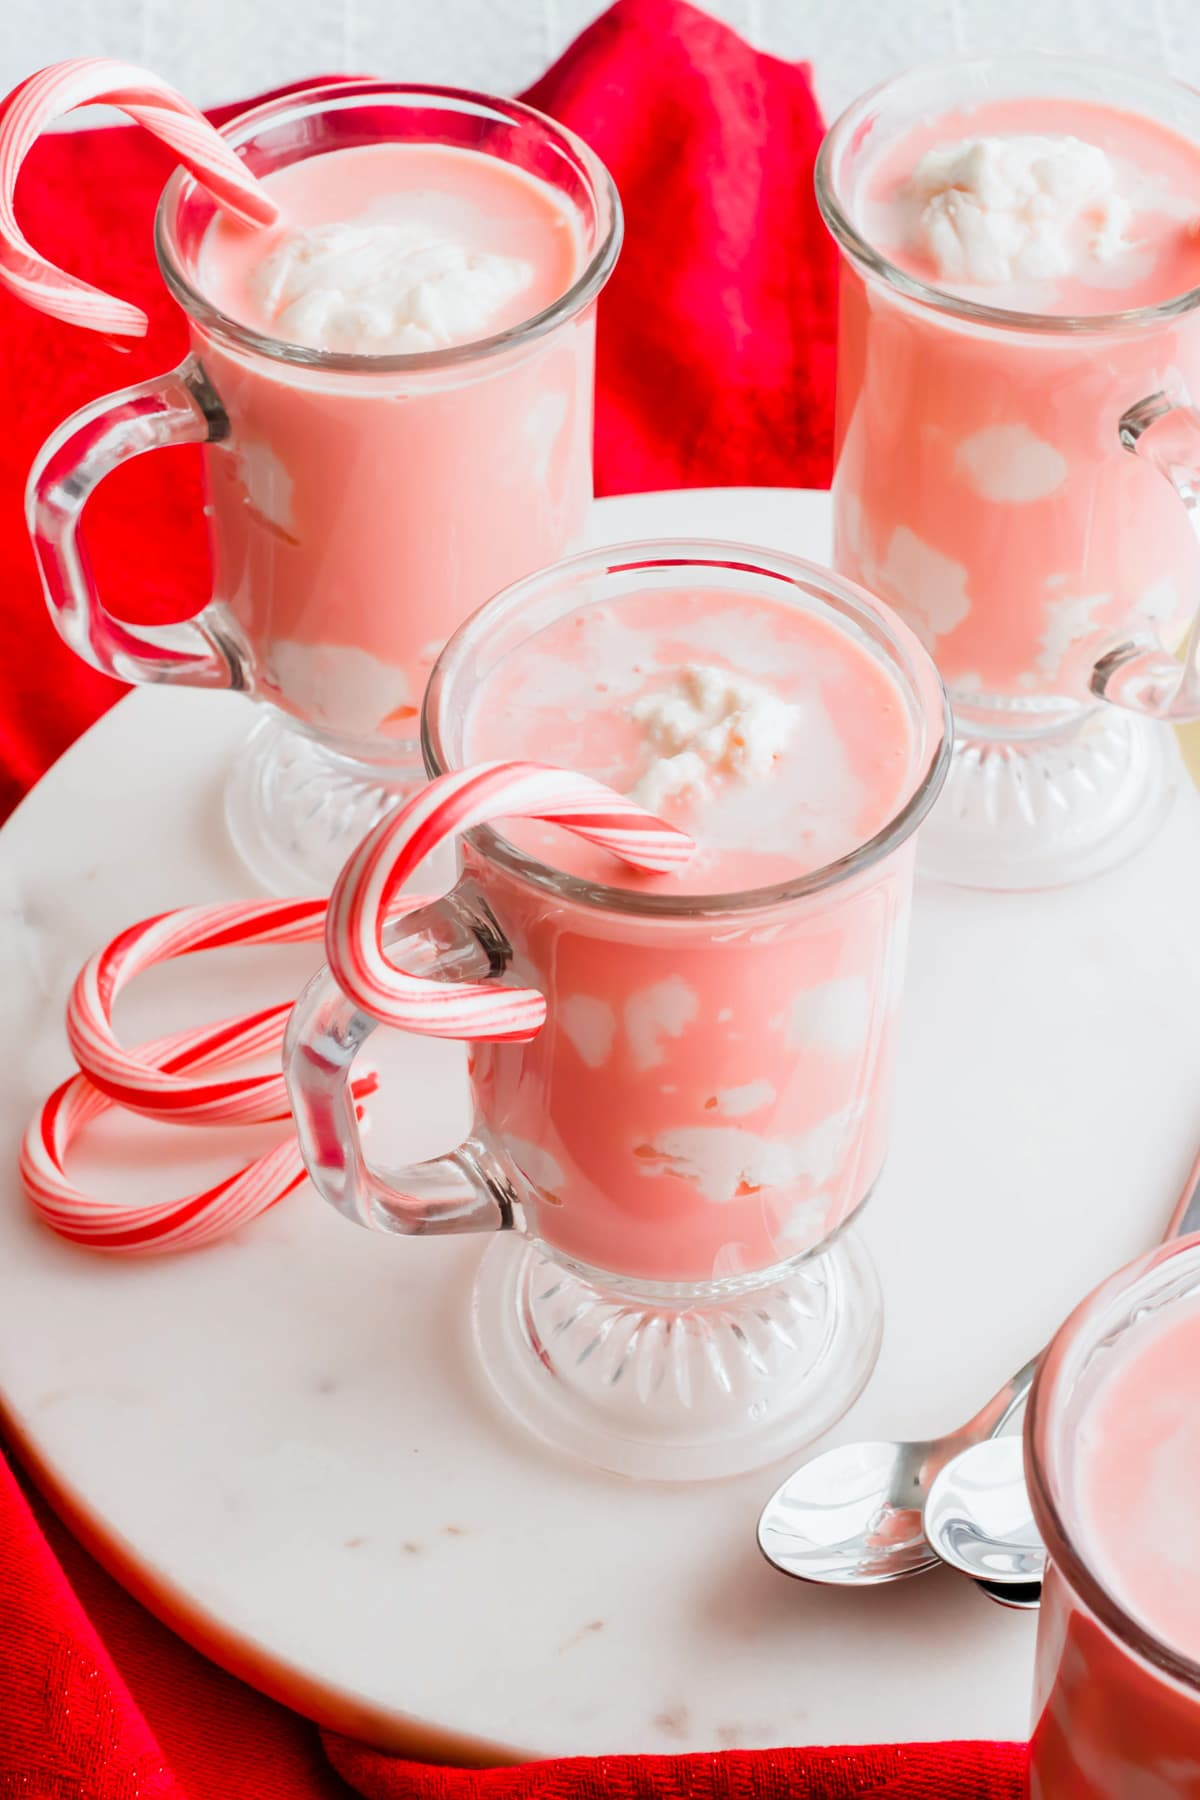 delicious Candy Cane Affogato recipe by top Houston lifesyle blogger Ashley Rose of Sugar and Cloth #recipes #christmas #holiday #entertaining #idea